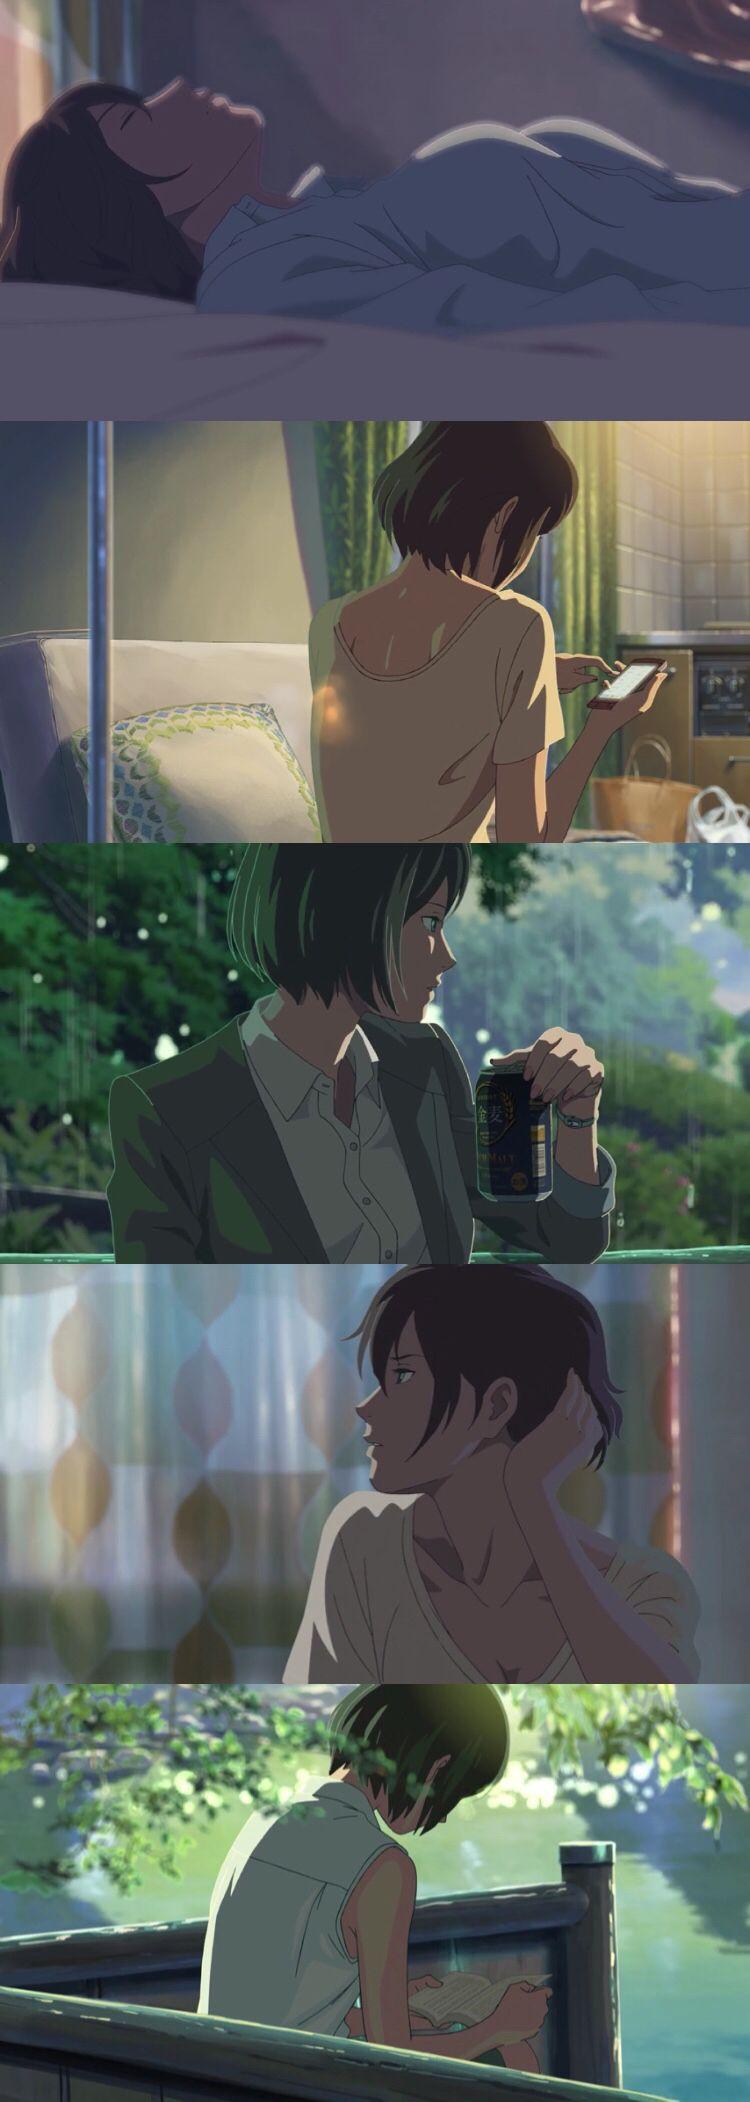 Yukino Garden Of Words Movie Wallpaper Ponsel